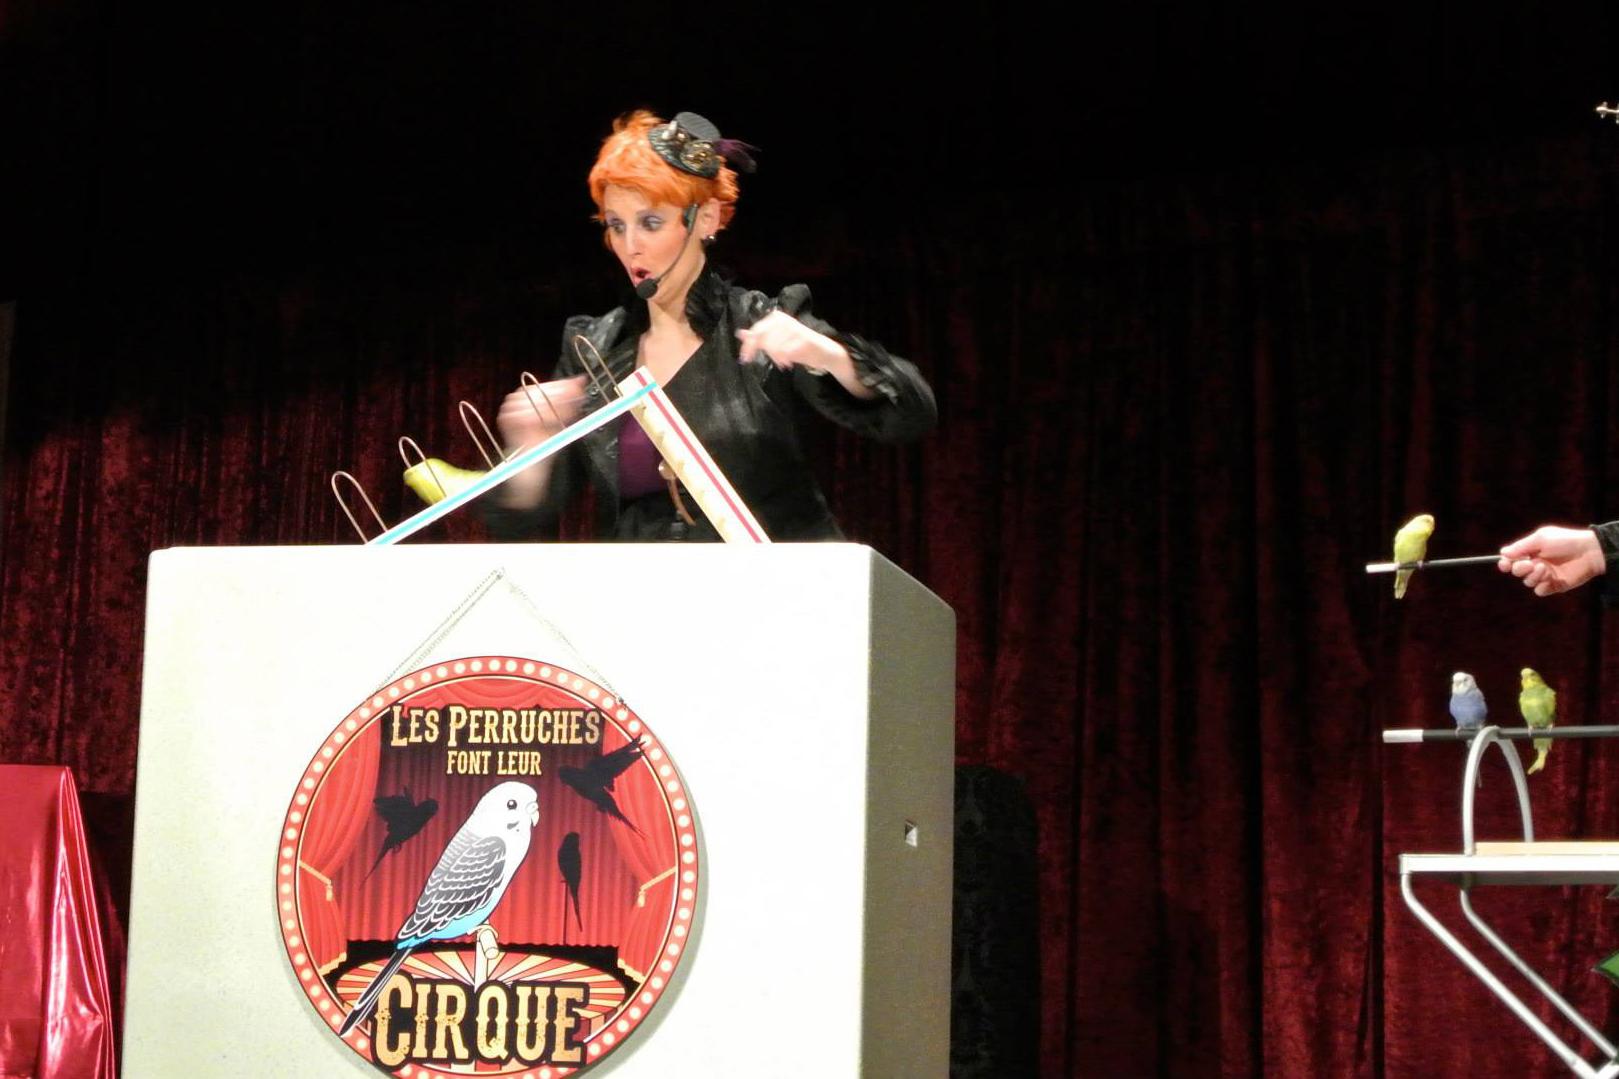 Perruches_cirque